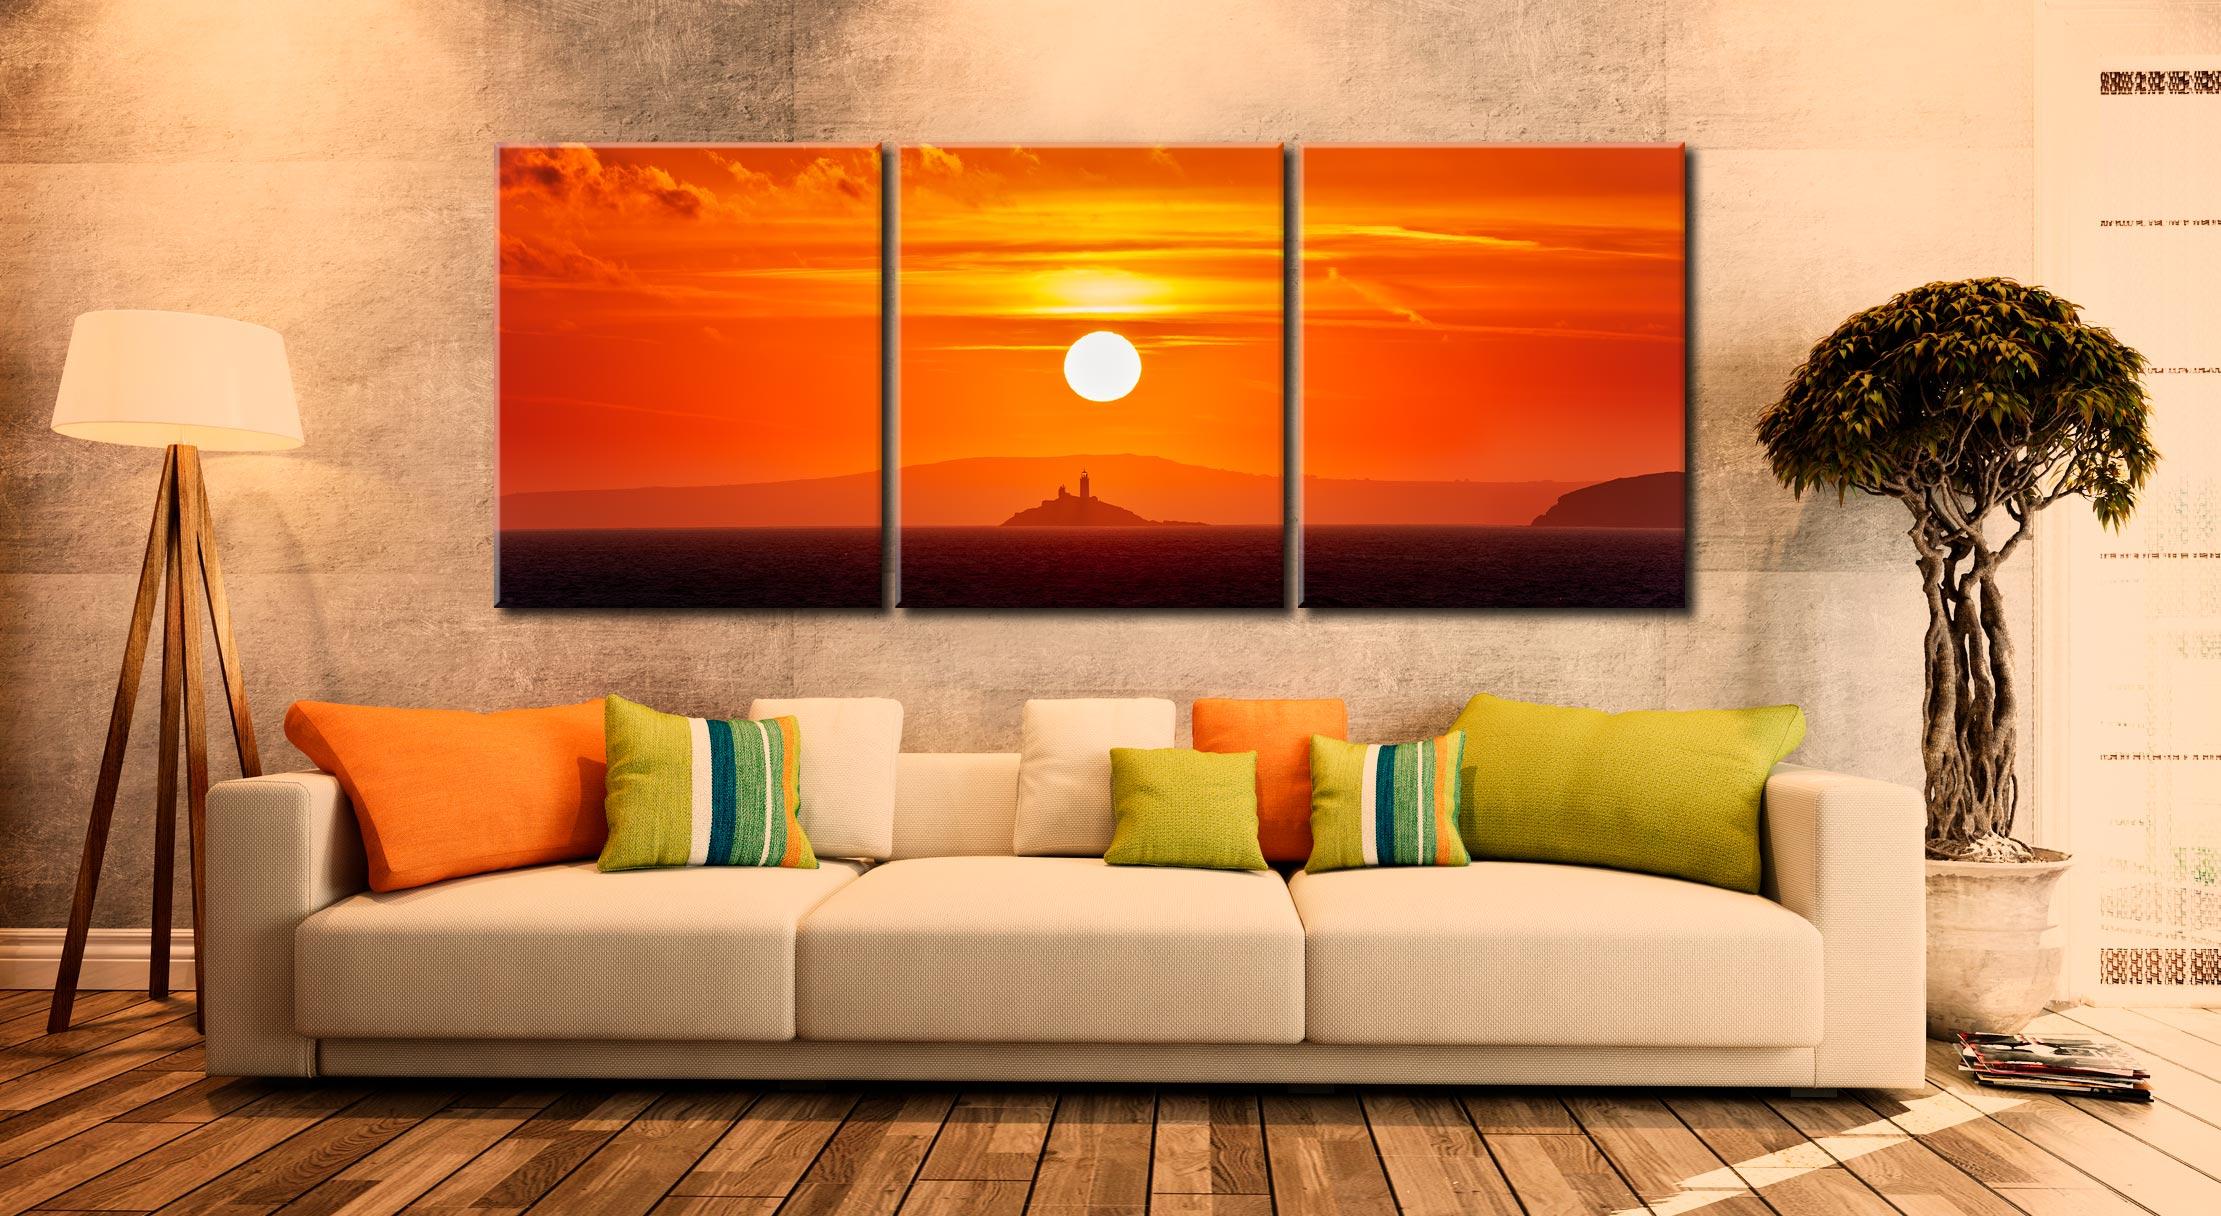 Godrevy Lighthouse Sunrise - 3 Panel Canvas on Wall